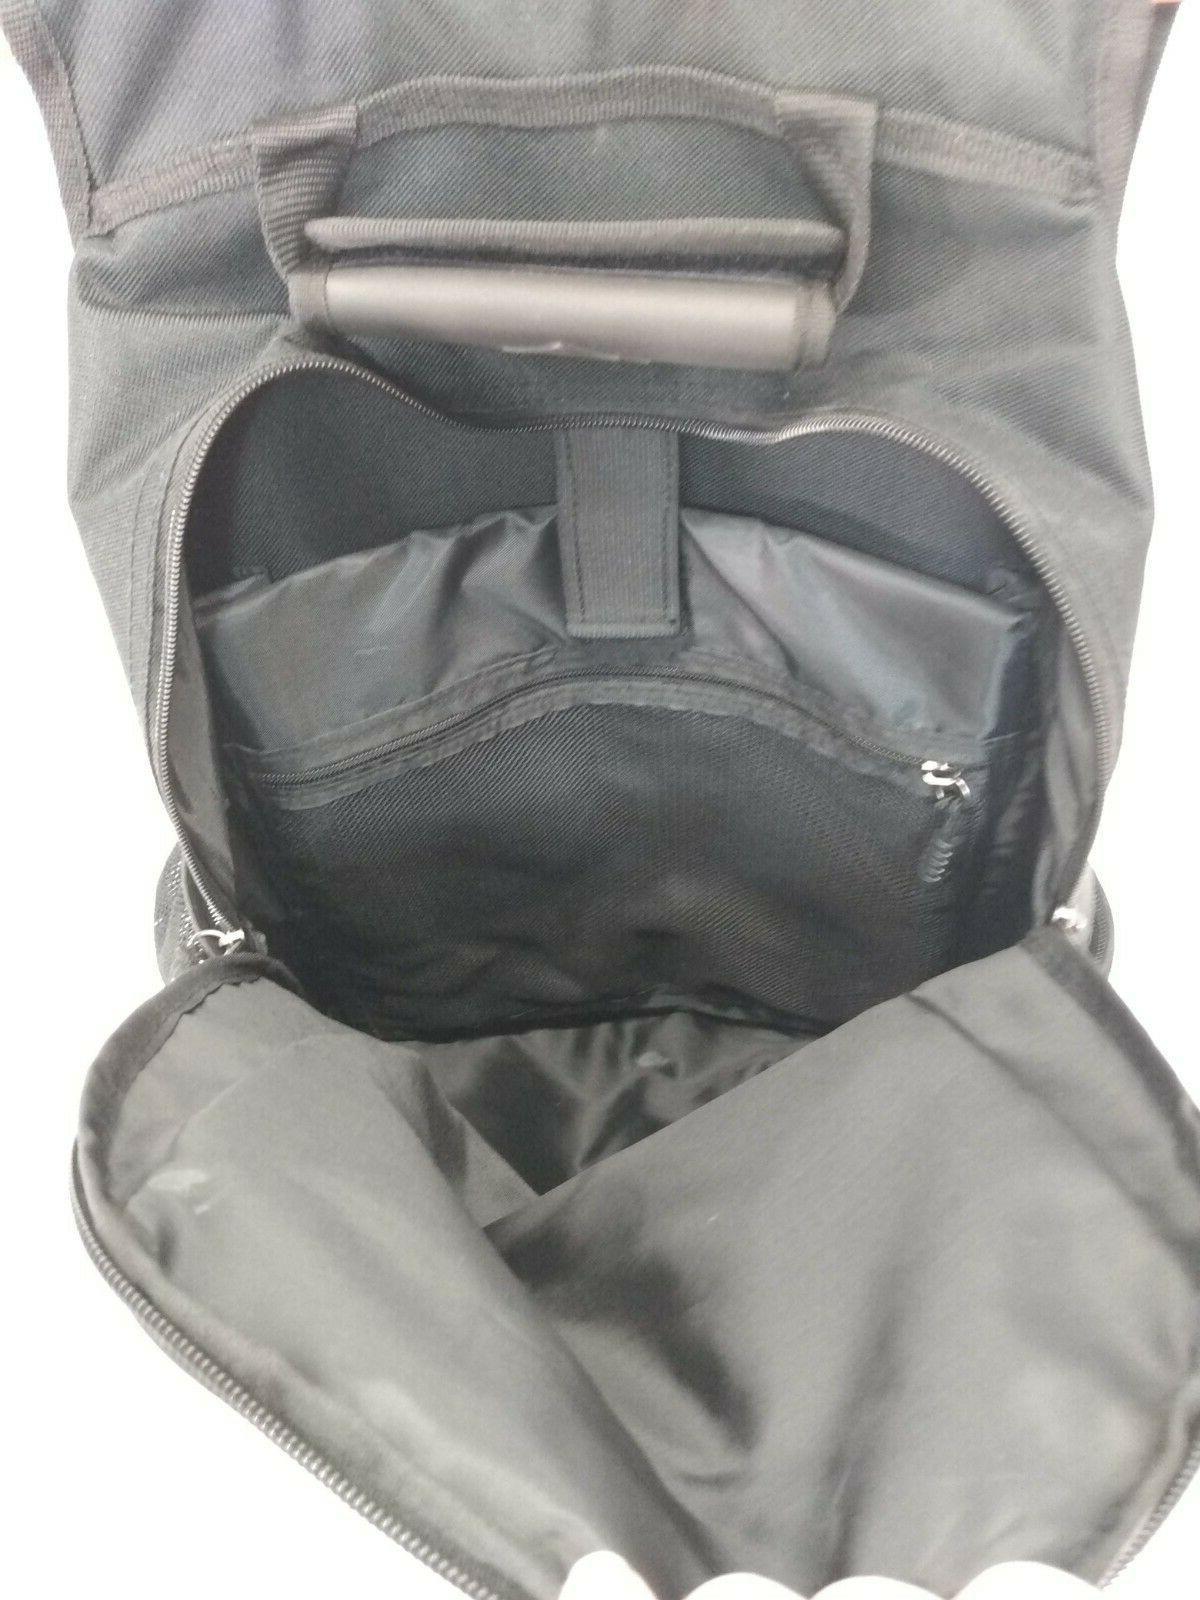 Harley Backpack